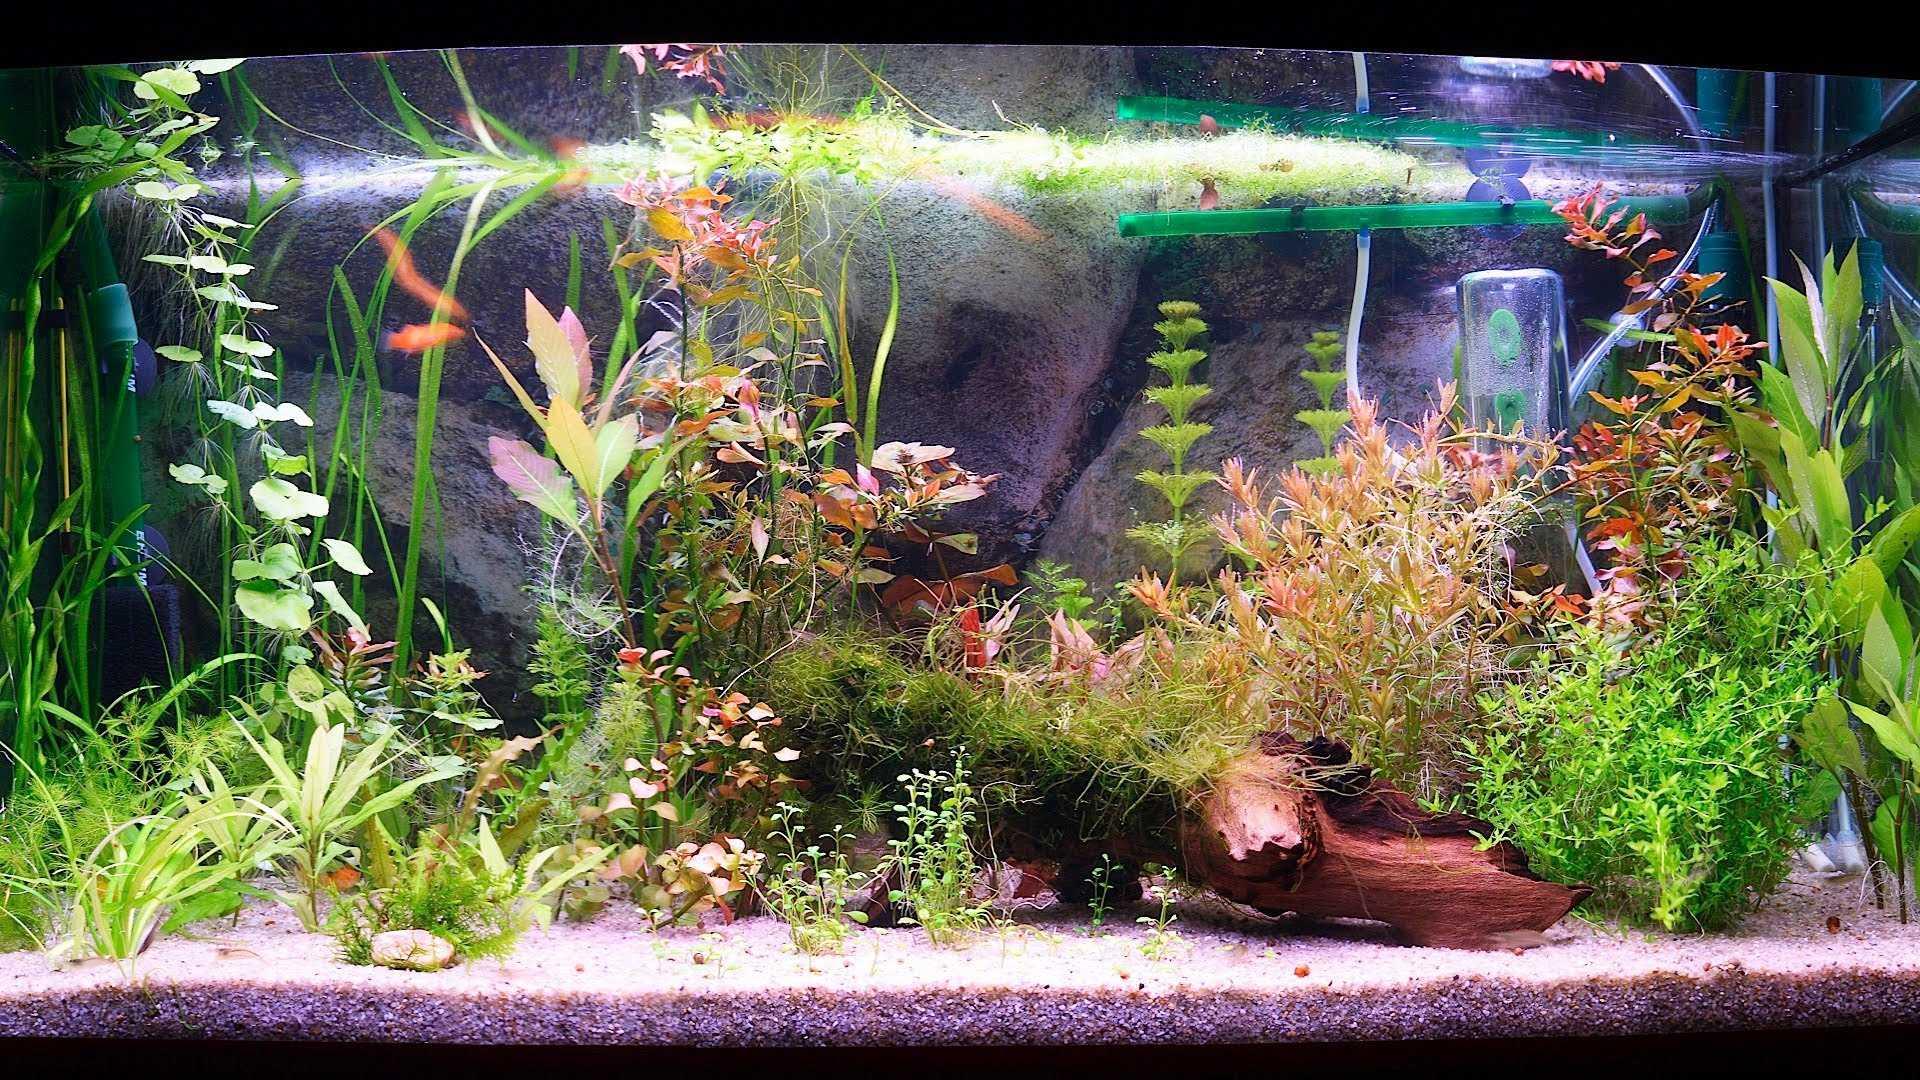 Top 5 petsmart fish tank filter types pros cons comparison for Petsmart fish aquariums